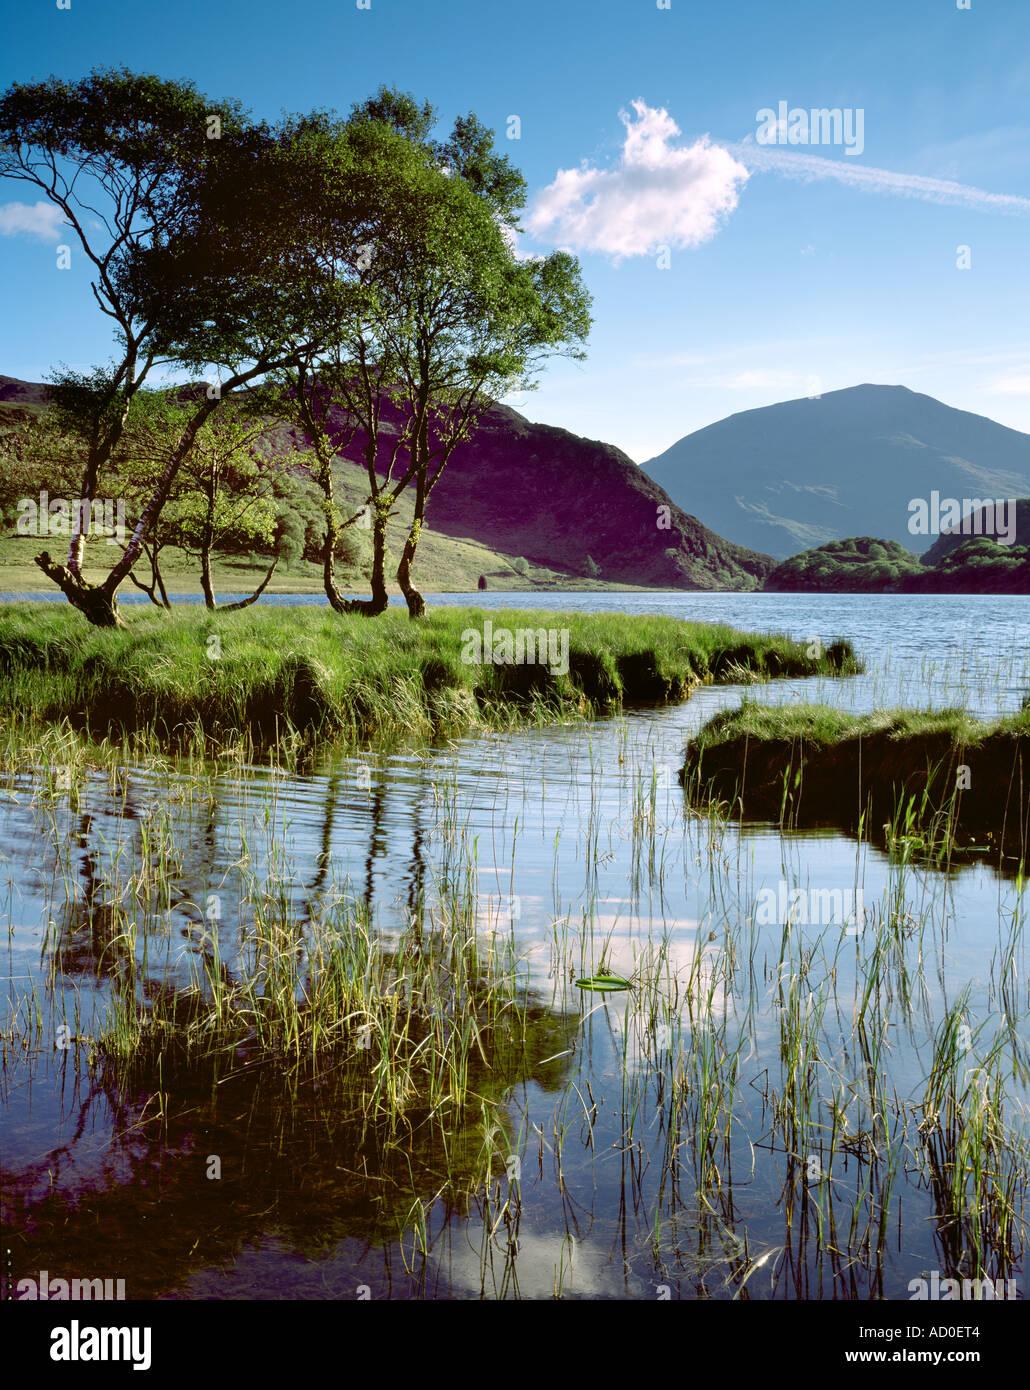 View across Llyn Dinas to Moel Hebog. Snowdonia National Park. Wales Stock Photo